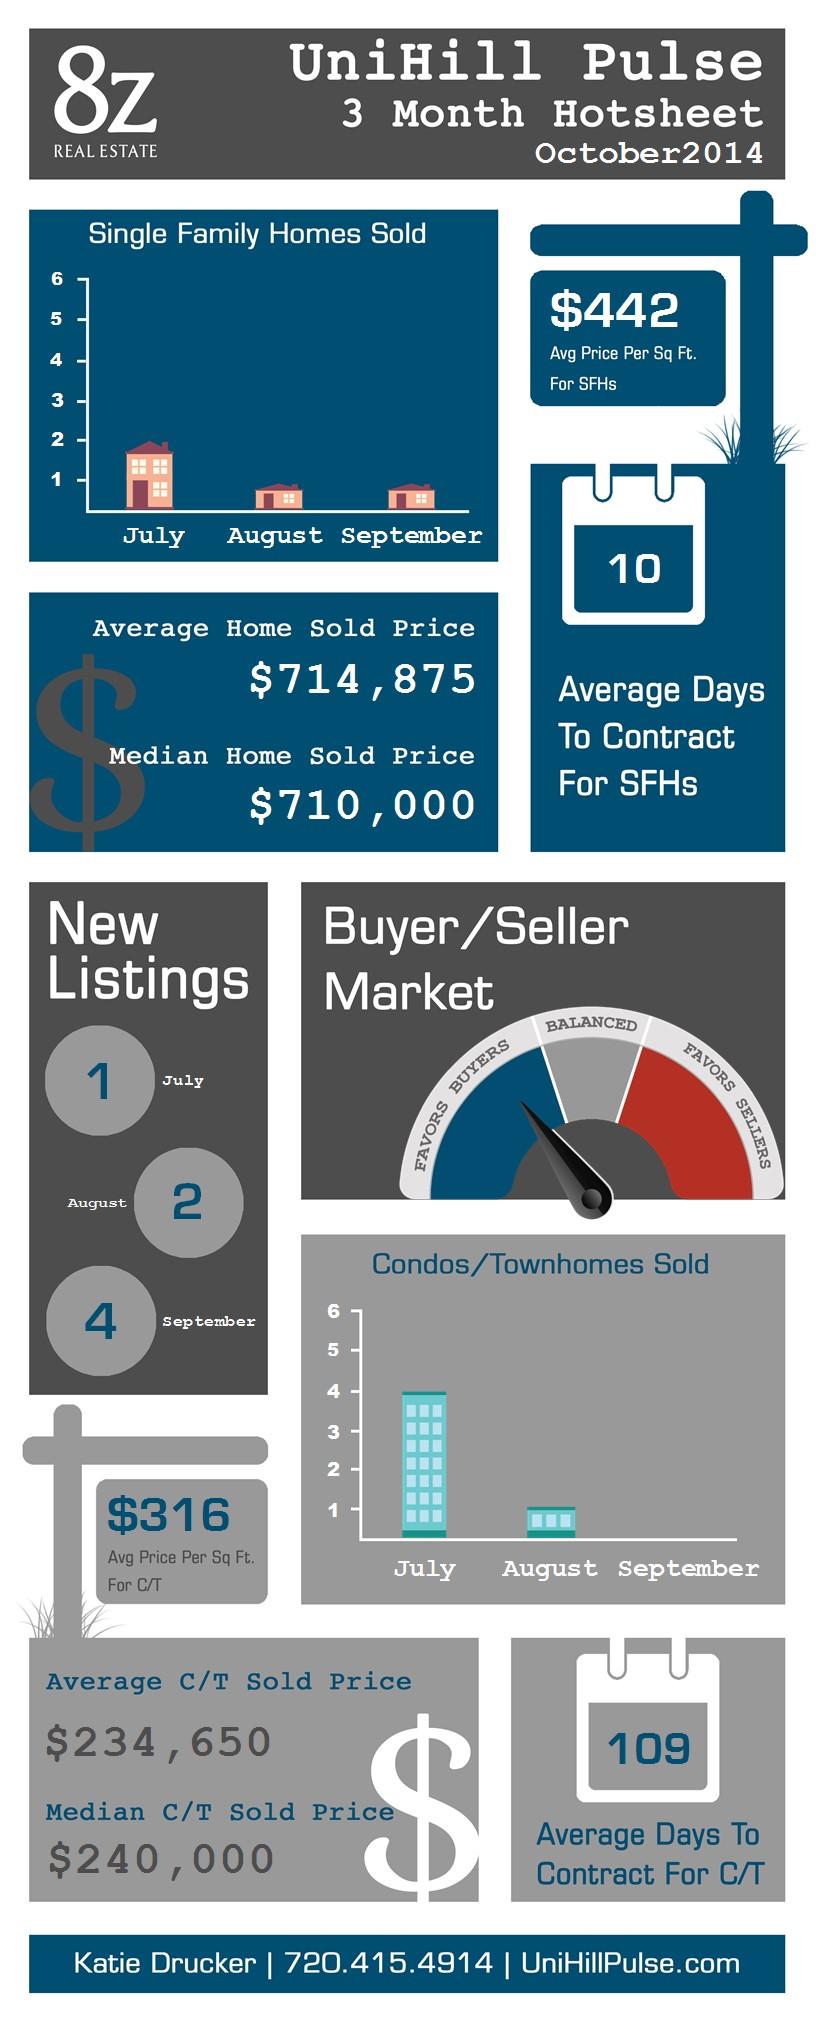 UniHill - Boulder, real estate infographic